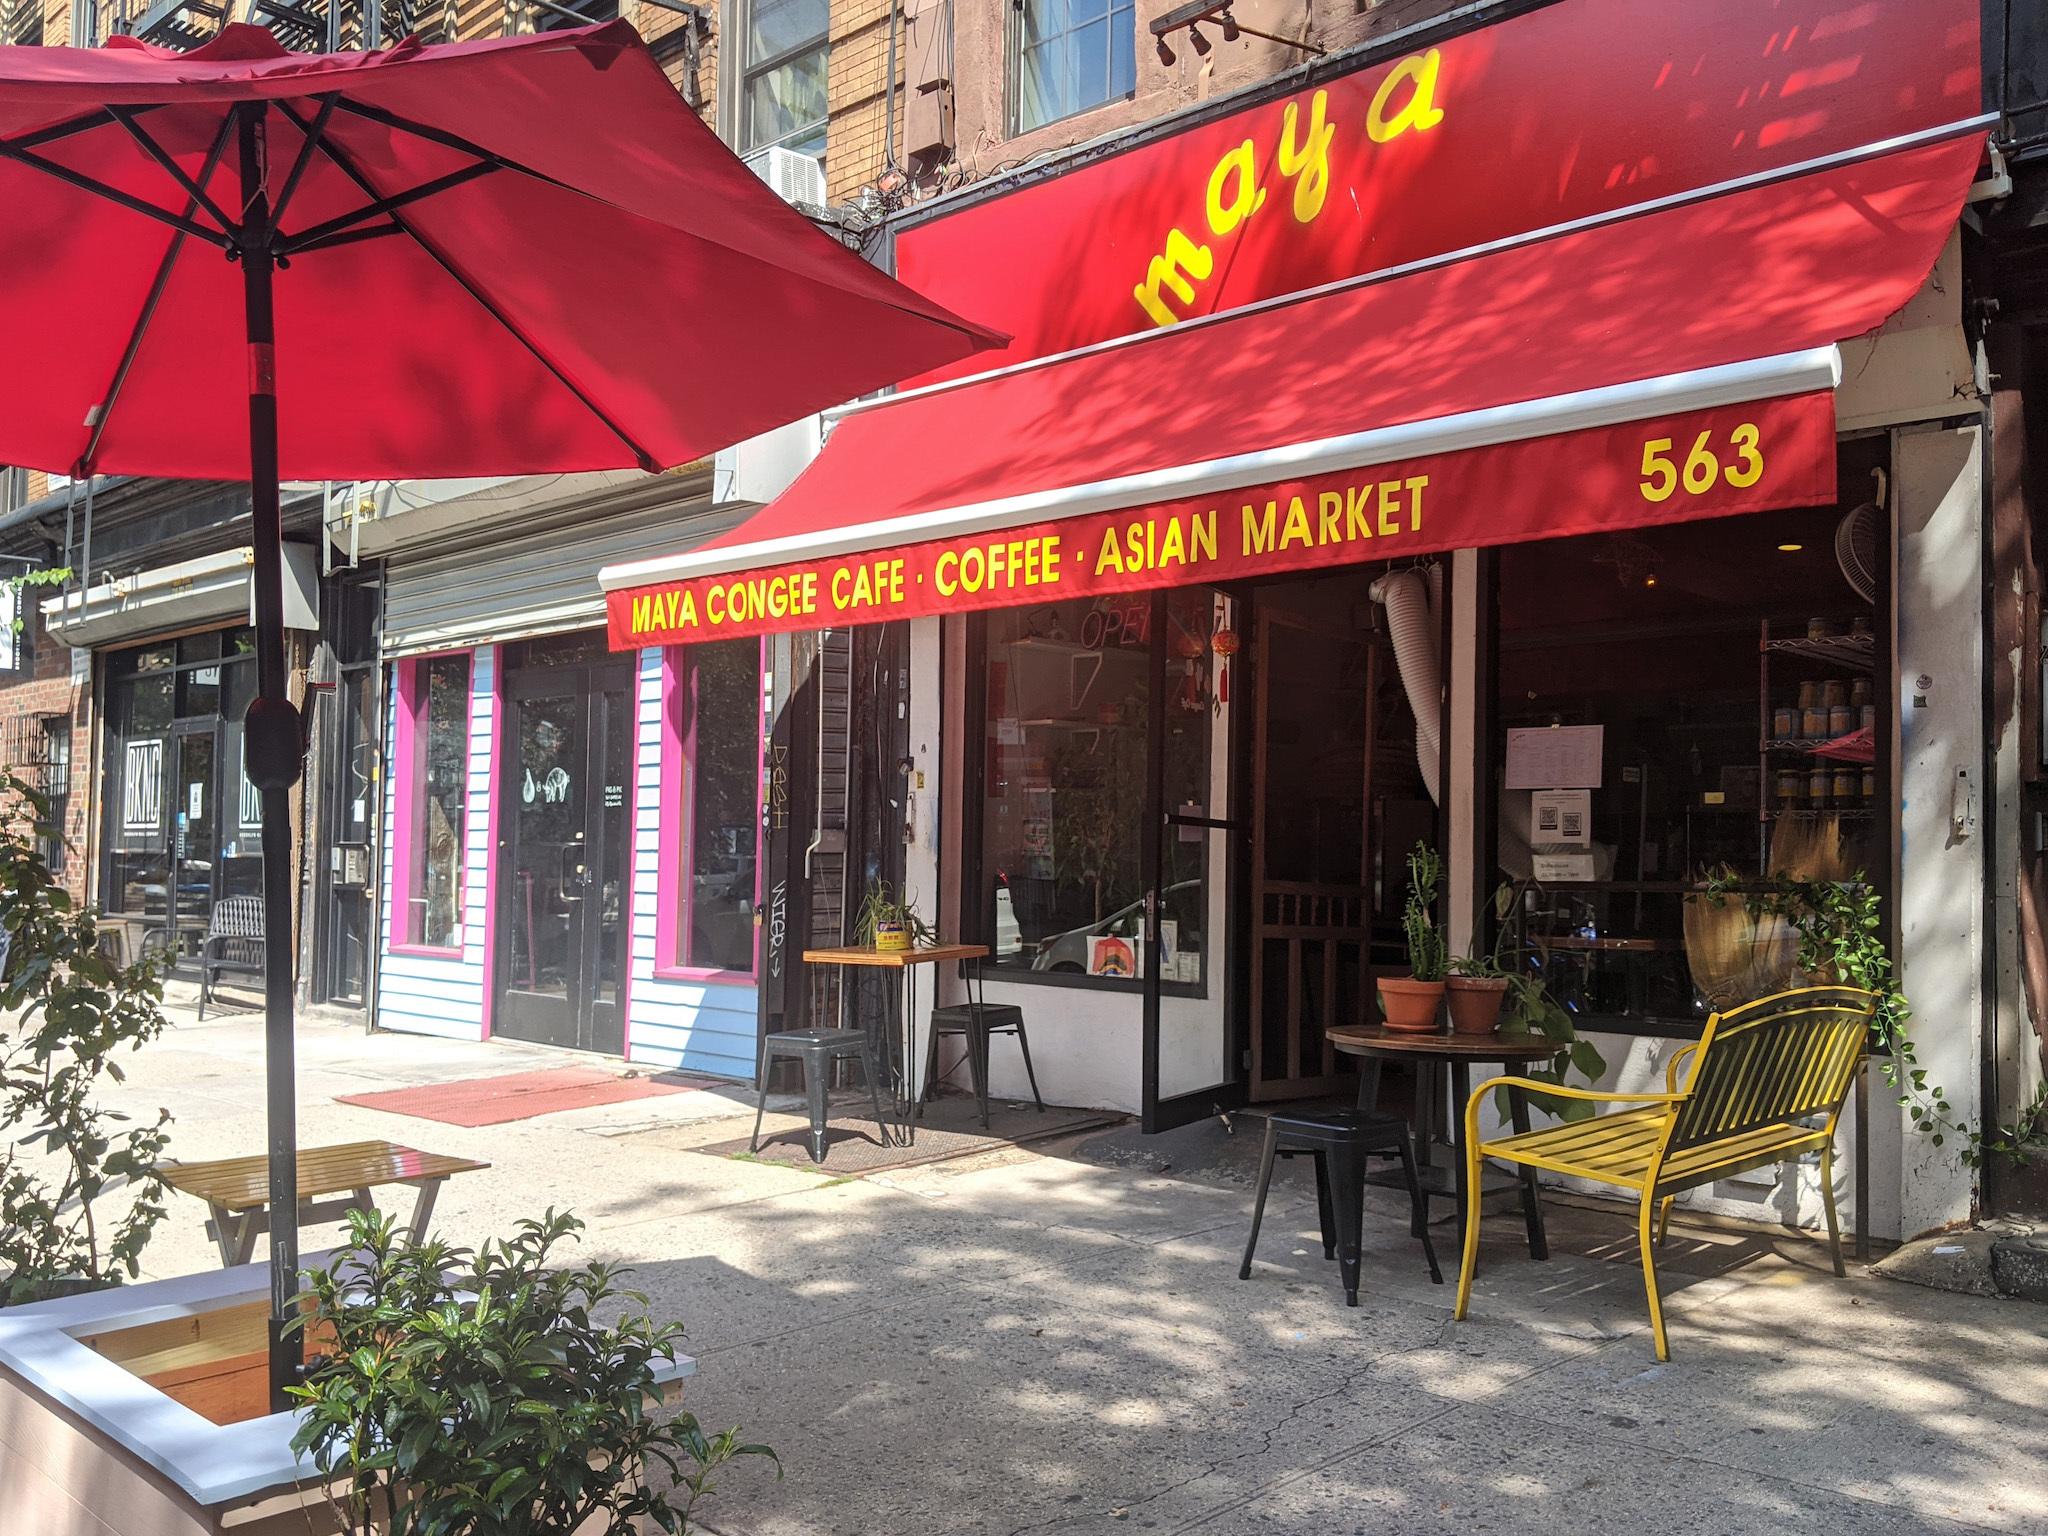 Maya Congee Cafe